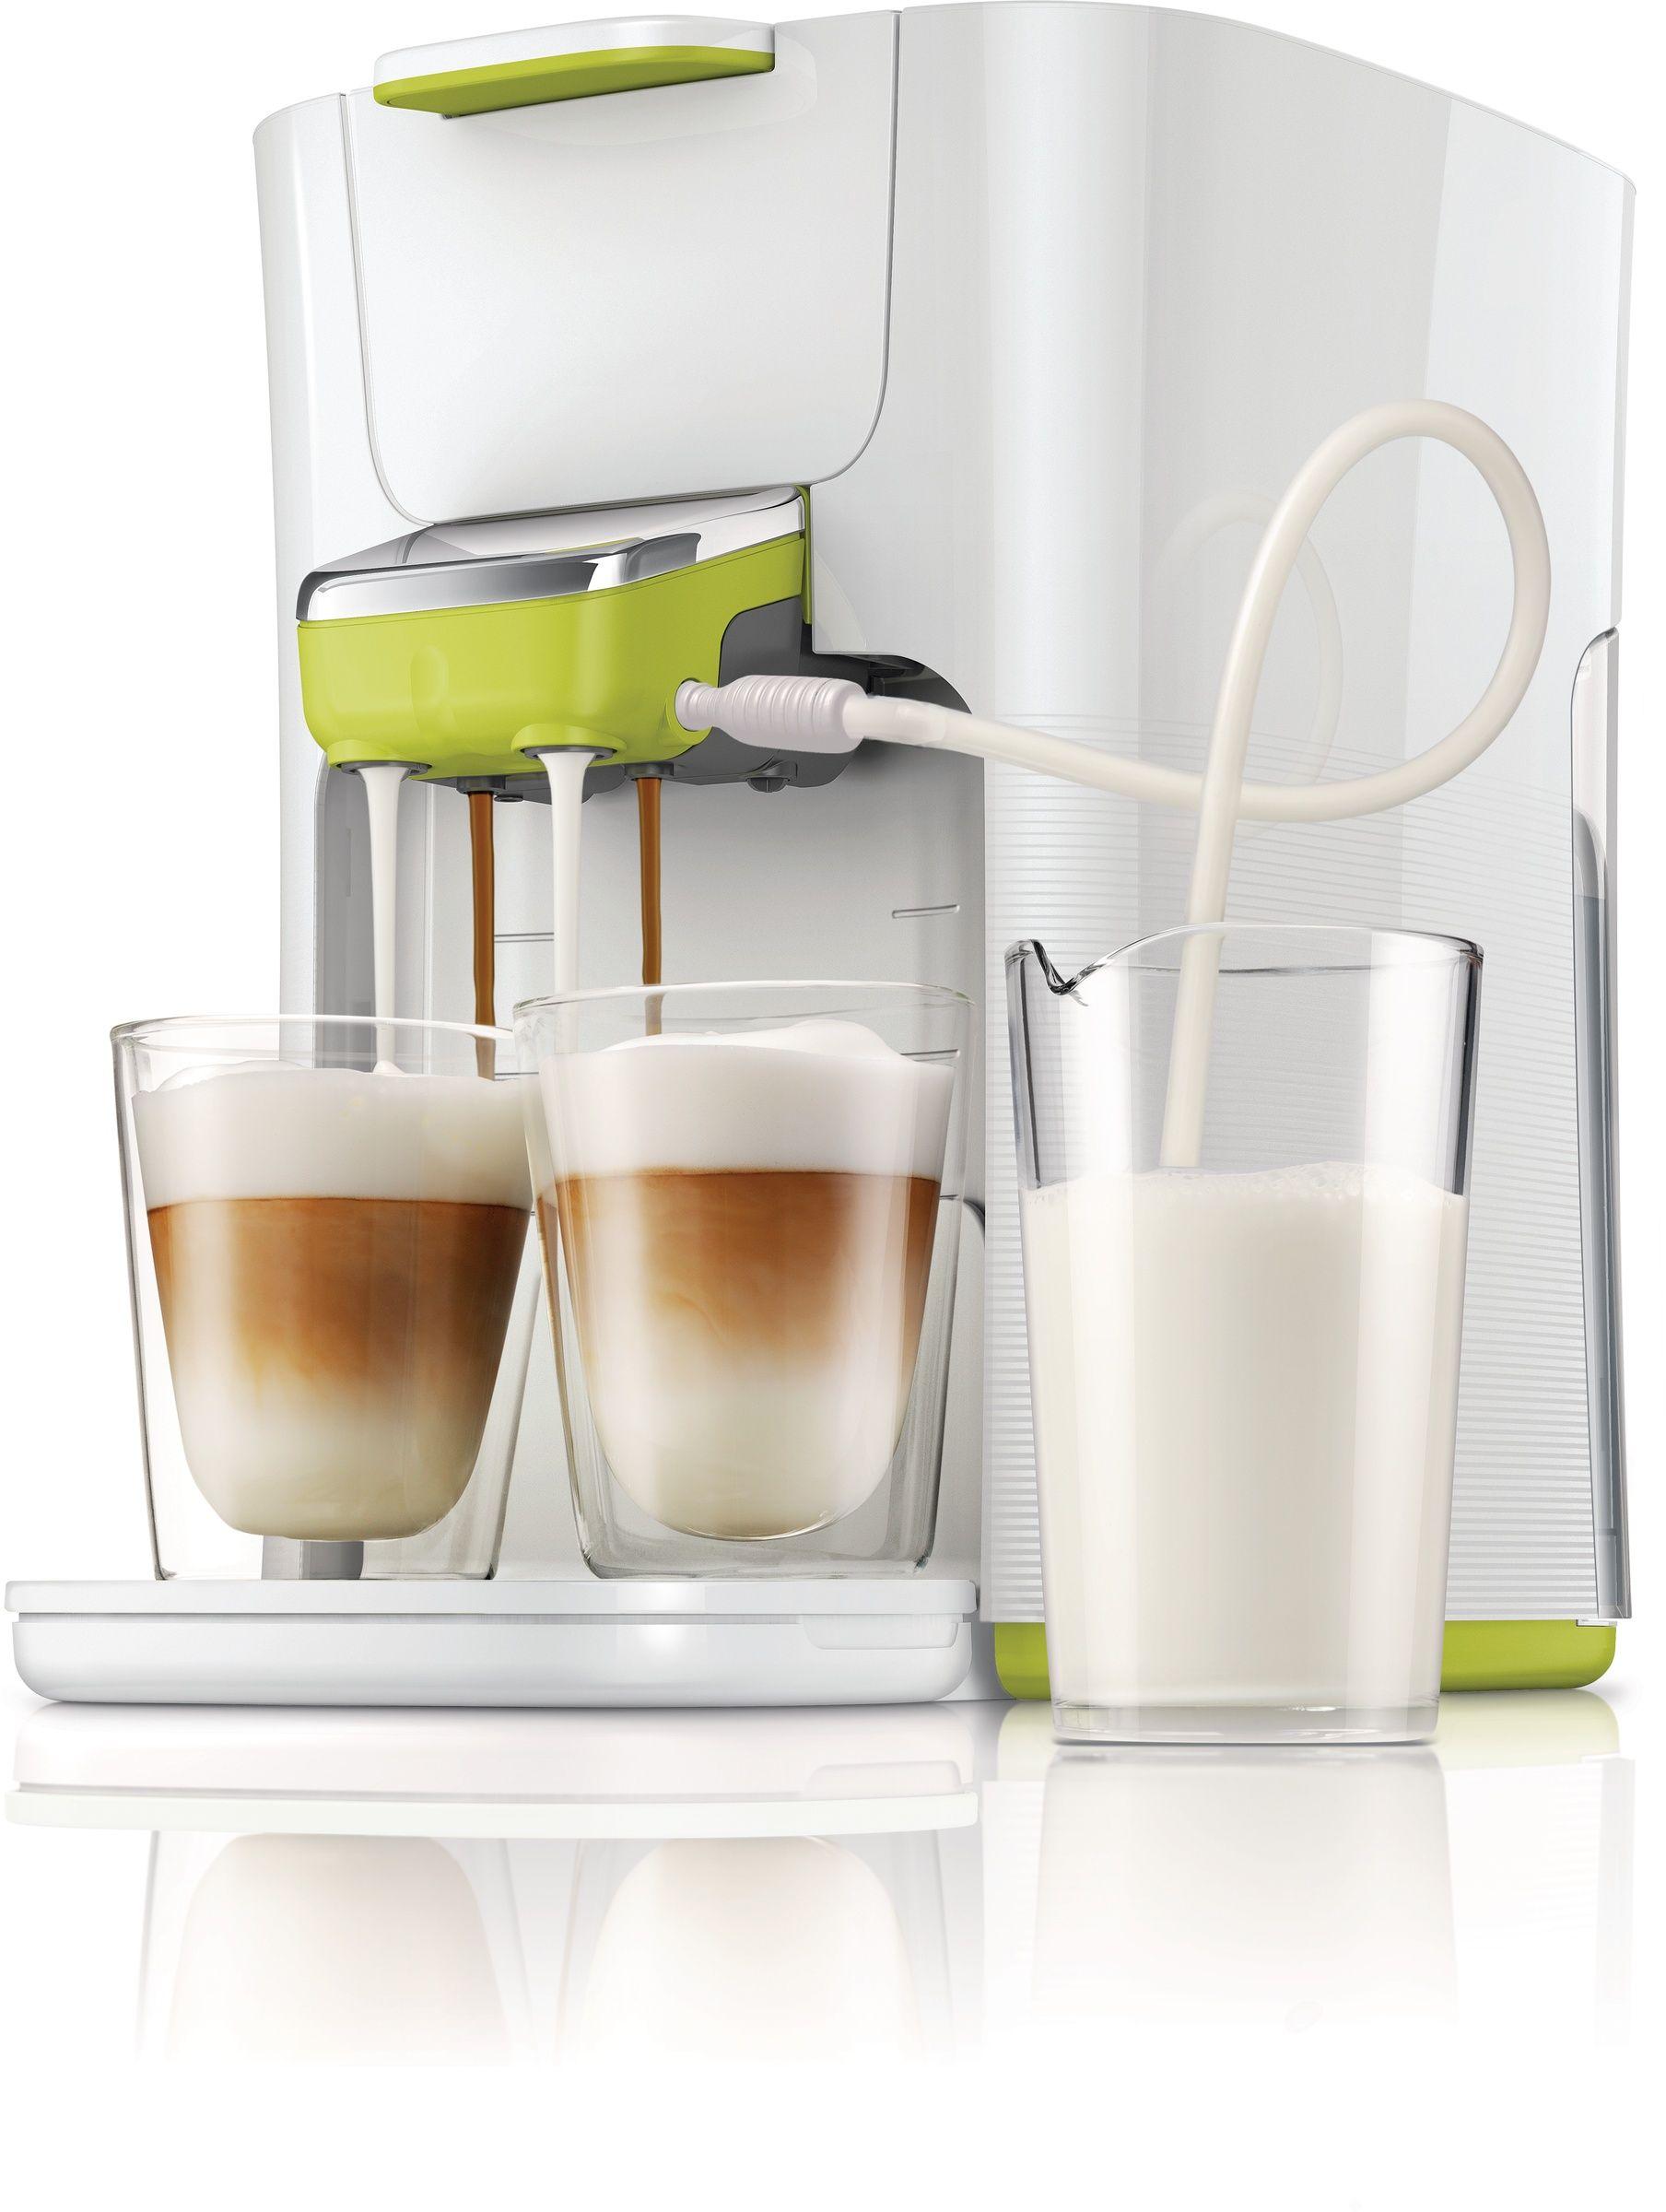 Senseo Latte Duo White Product Shot Jpg 1808 2400 Pod Coffee Machine Coffee Industrial Kitchen Design